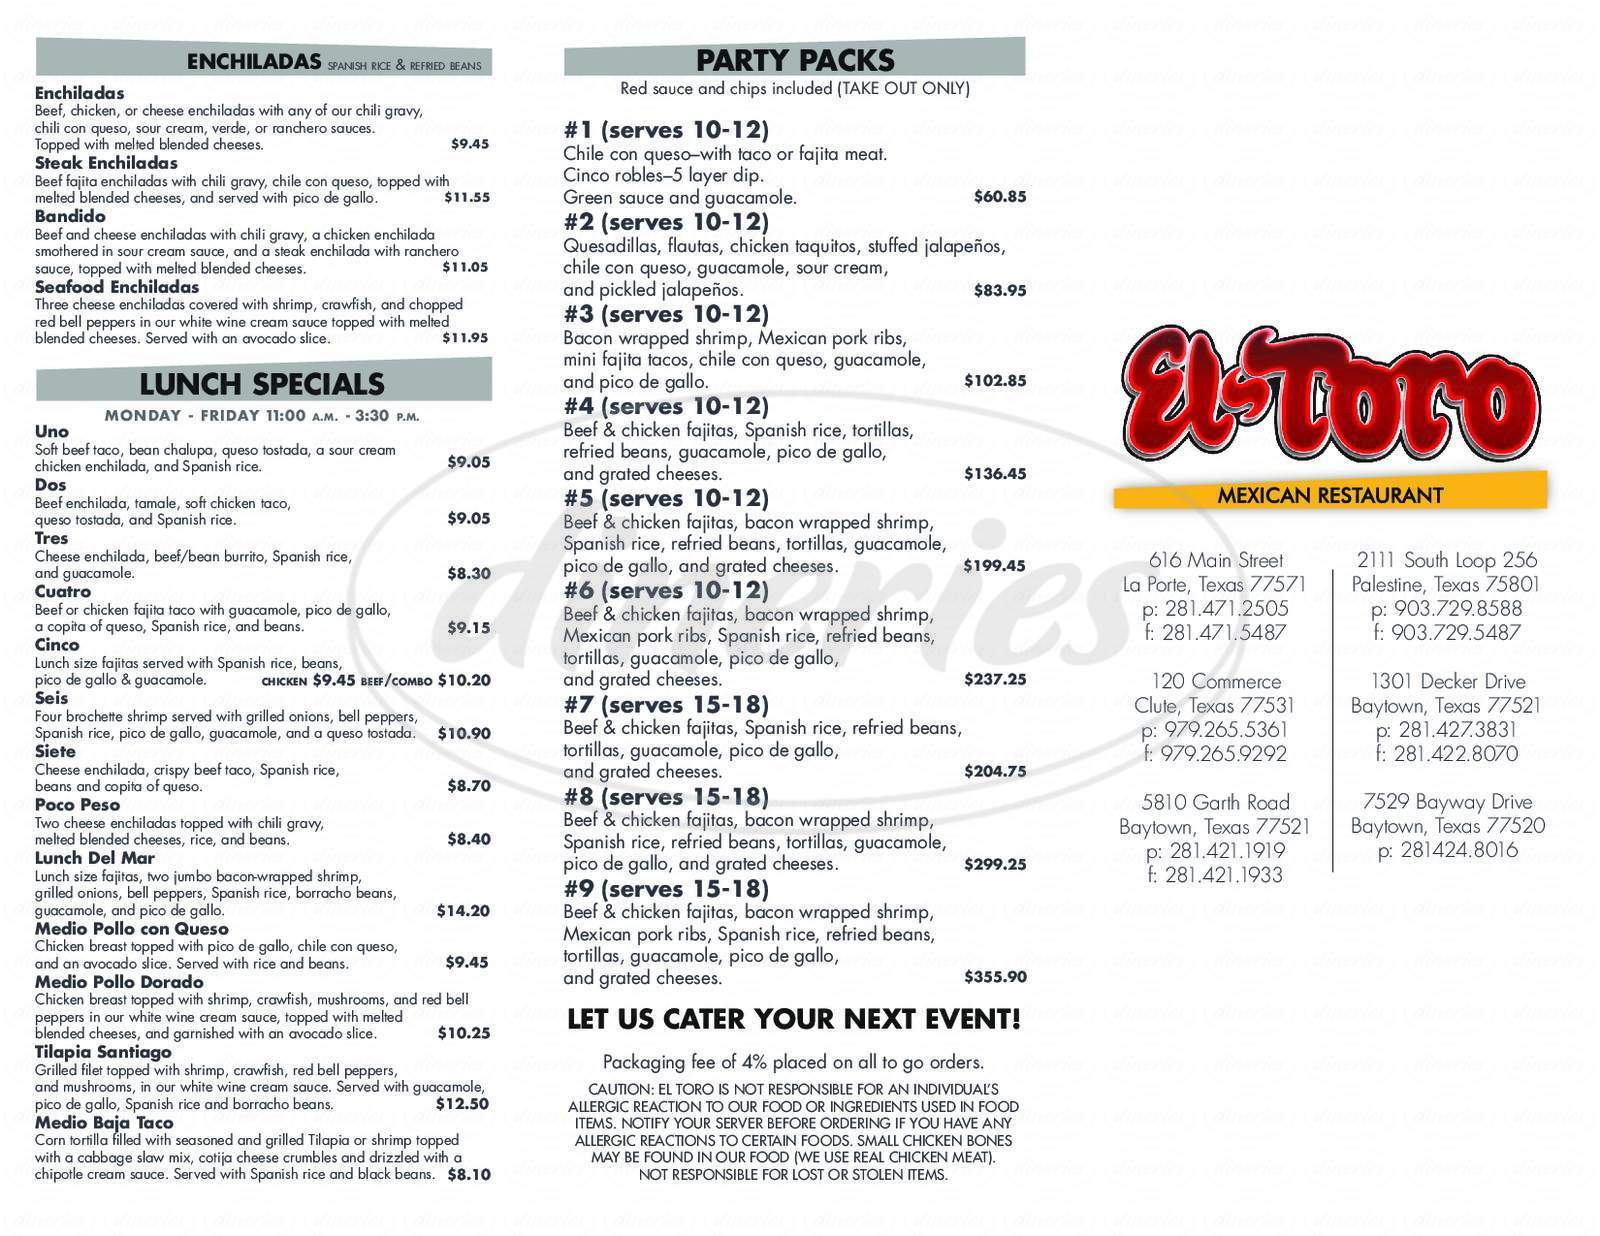 El Toro Mexican Restaurant Menu La Porte Dineries - Porte menu restaurant